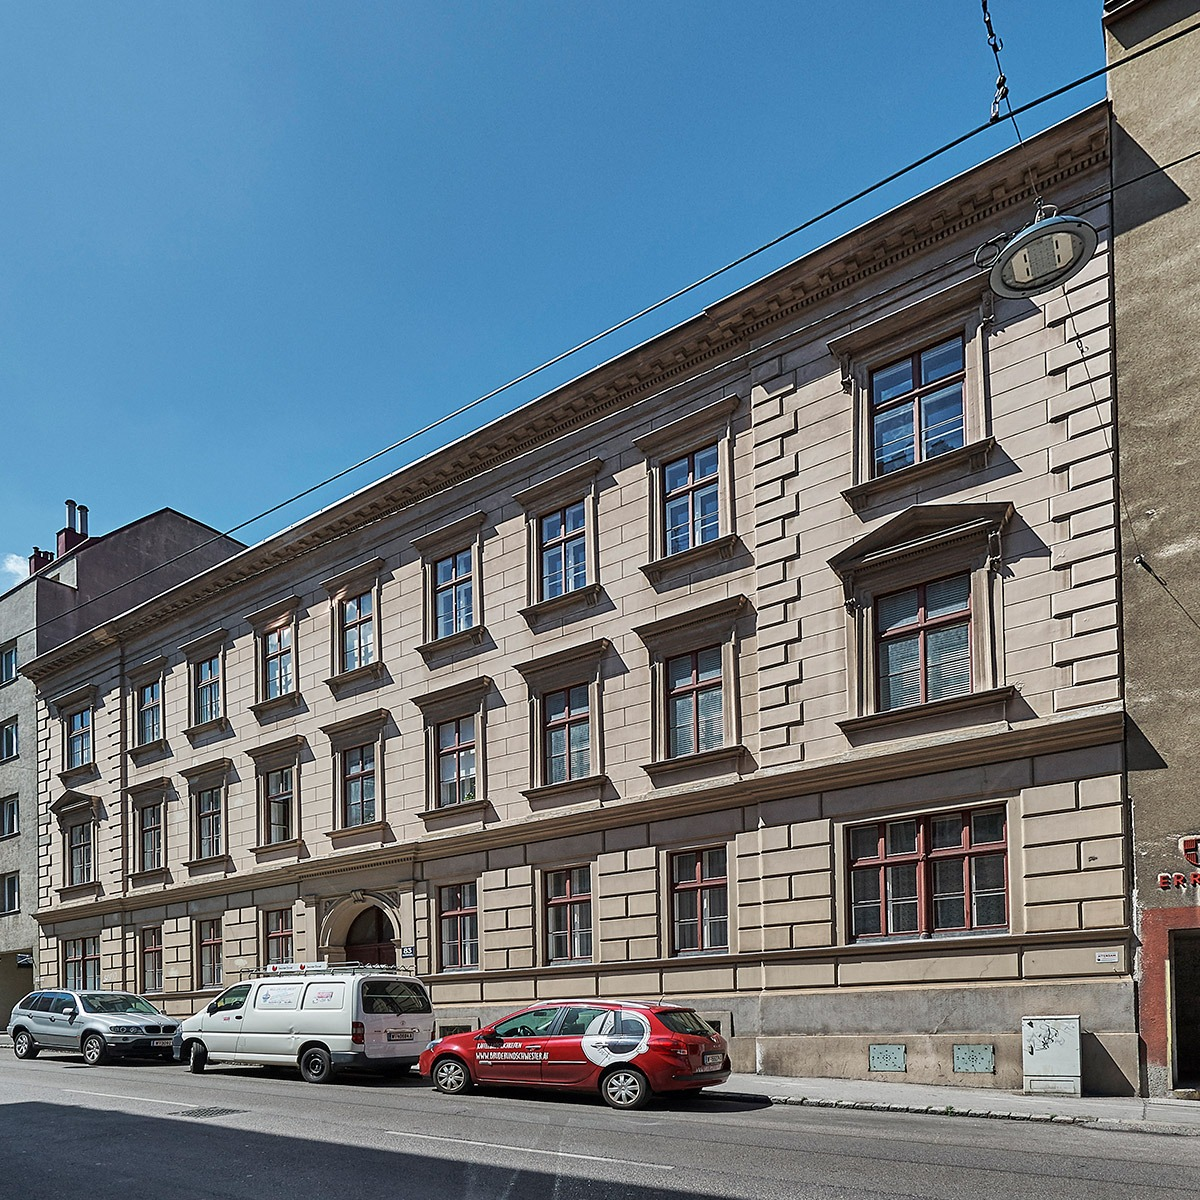 2018 1180 Martinstraße